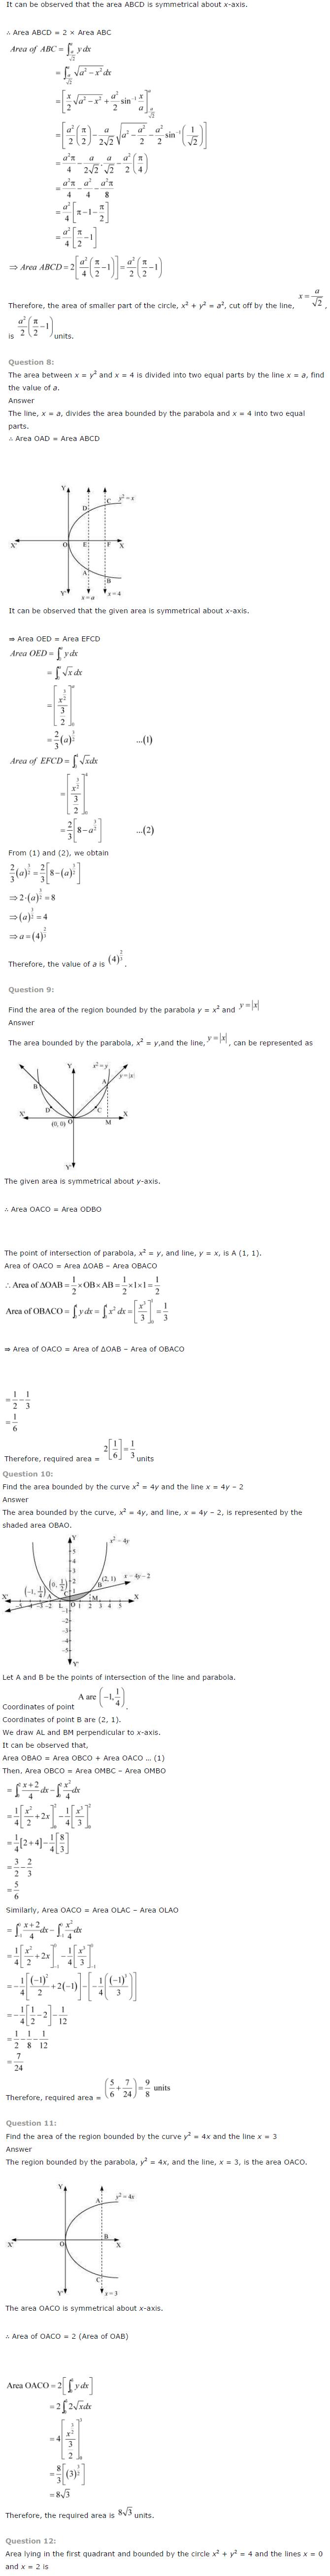 NCERT Solutions for Class 12 Maths Chapter 8 Application of Integrals ex 8.2